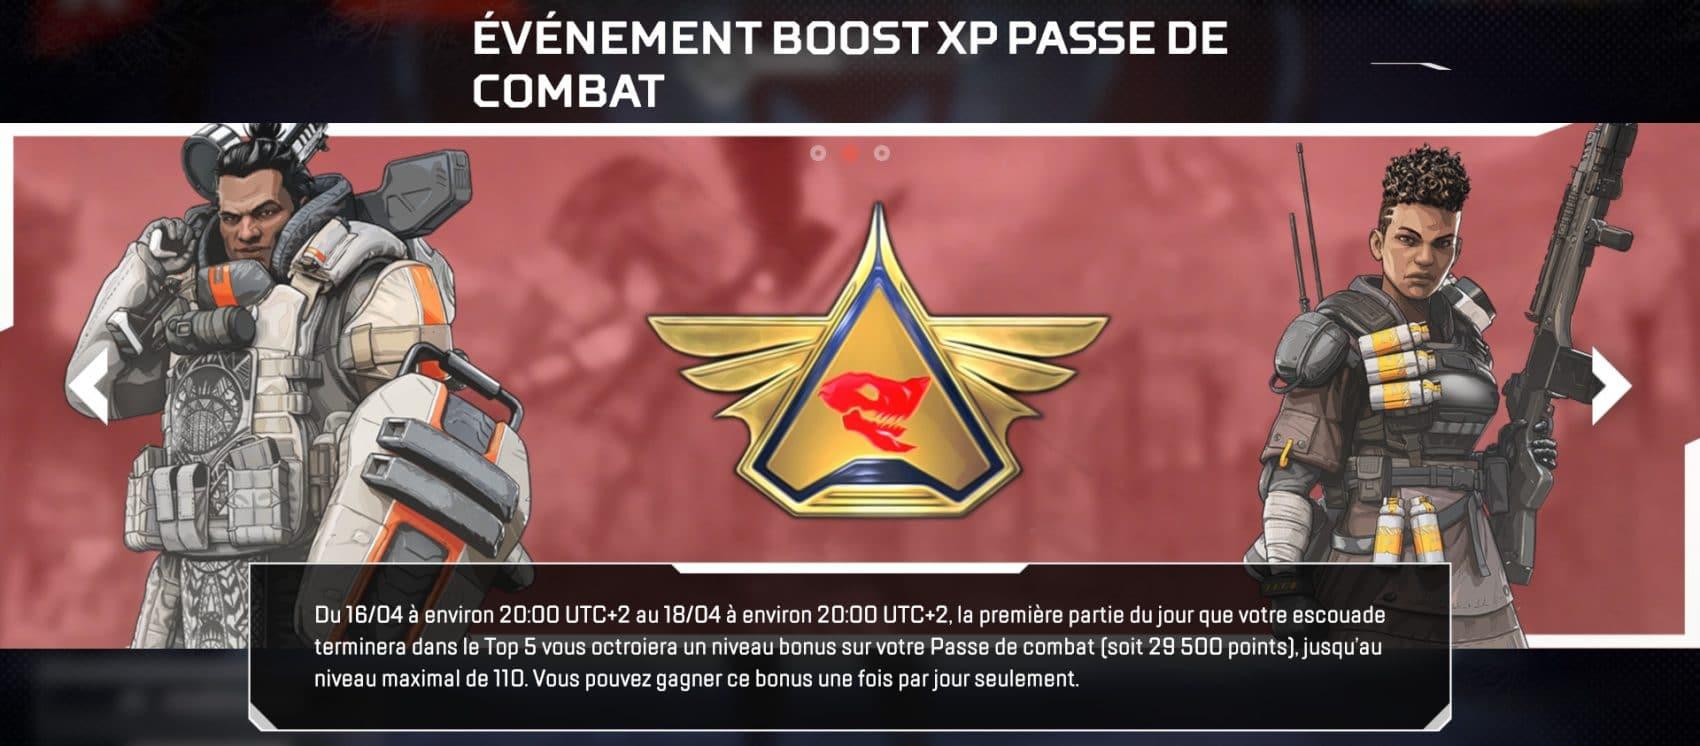 Boost XP Pass de combat